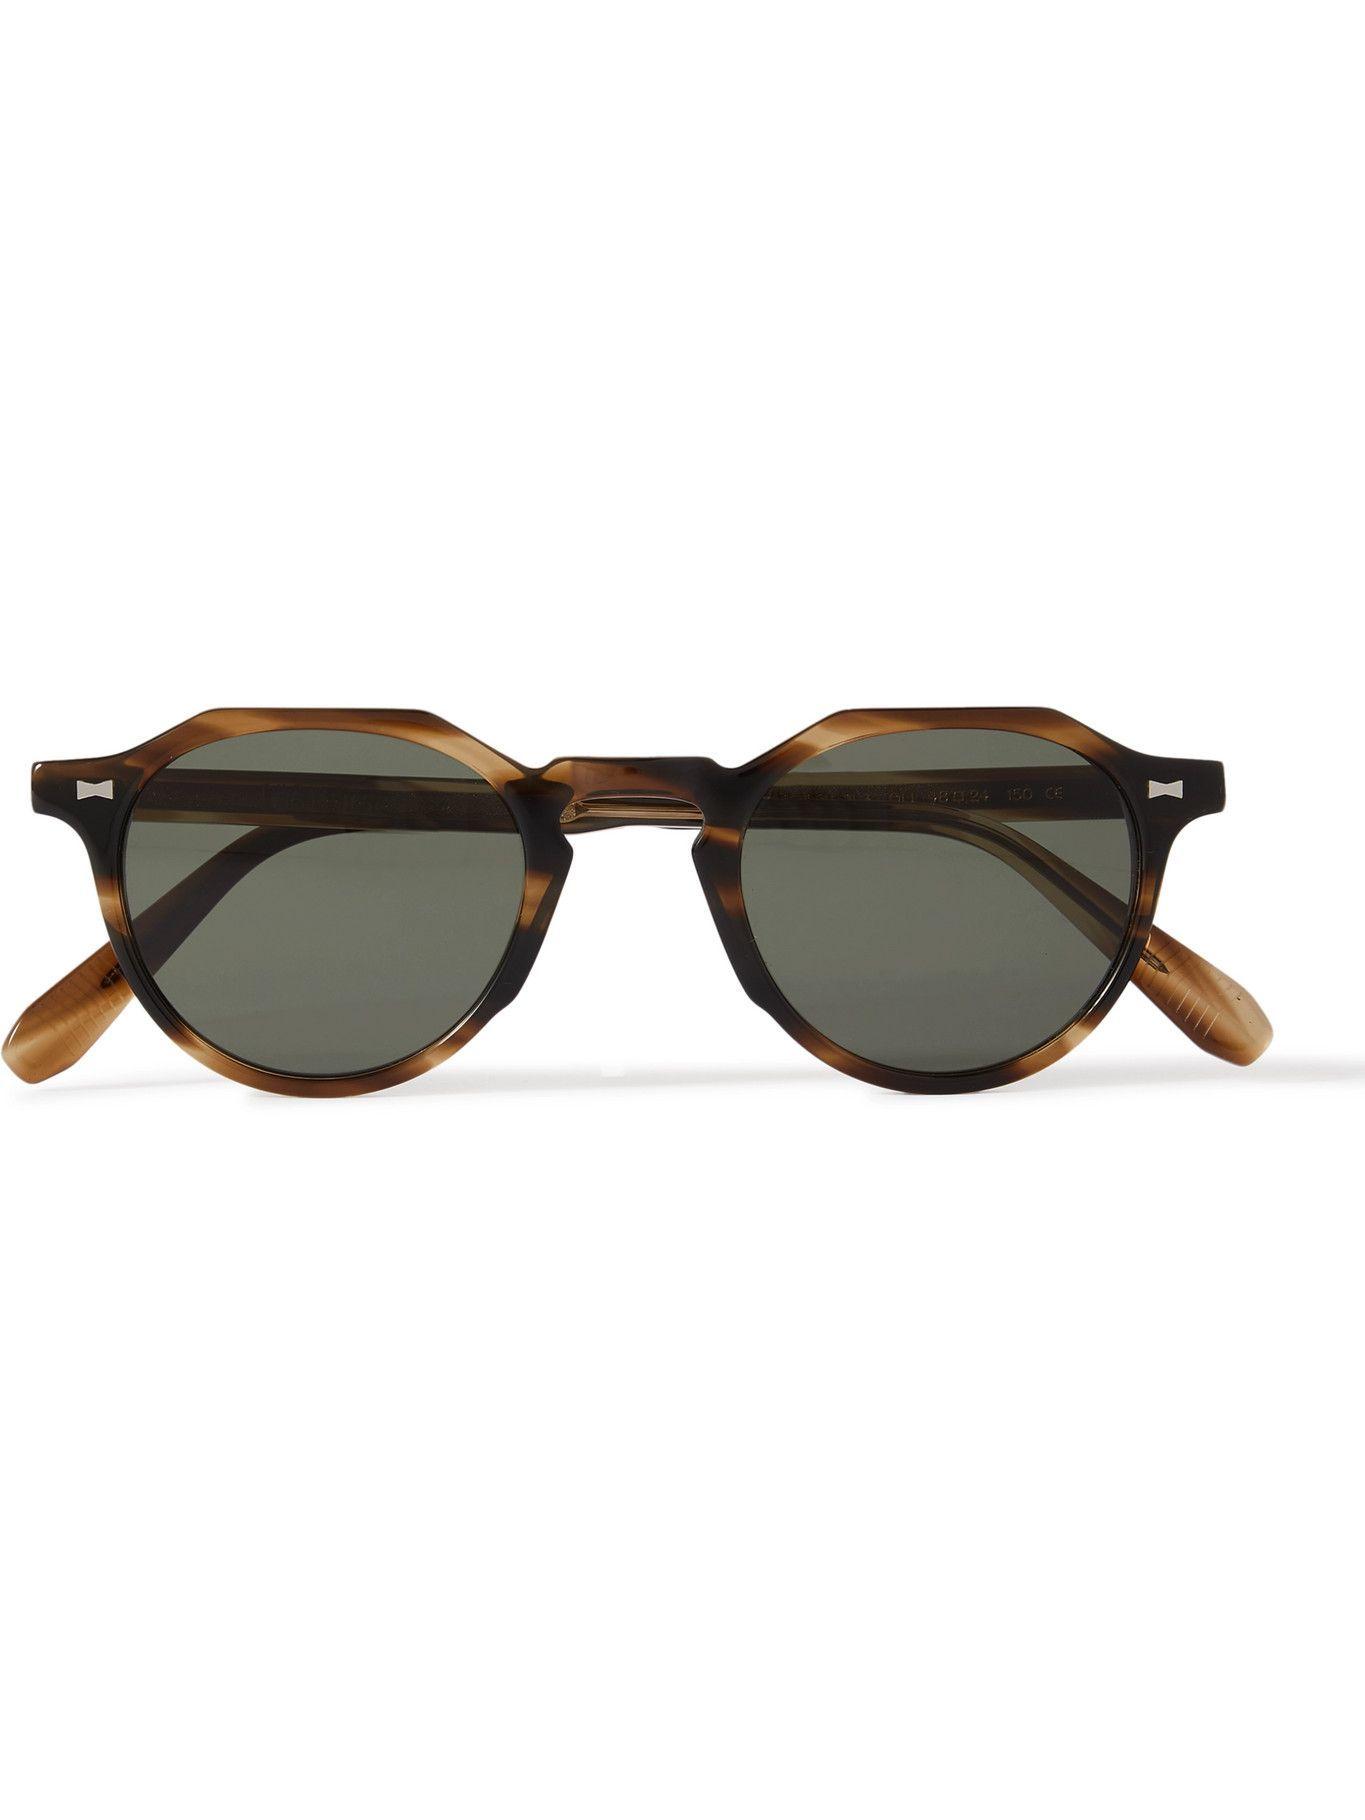 Photo: CUBITTS - Calthorpe Round-Frame Tortoiseshell Acetate Sunglasses